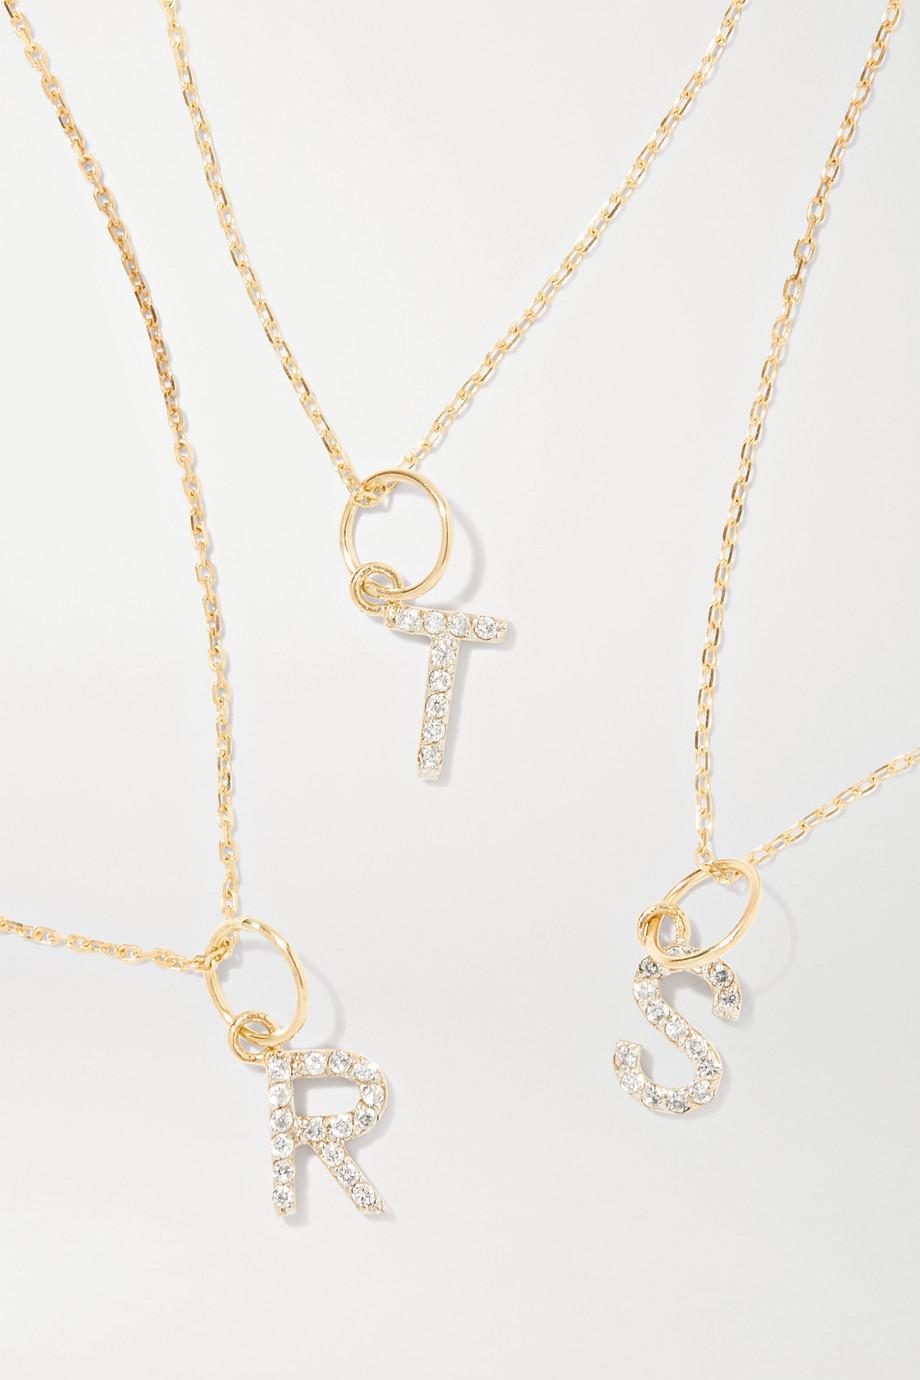 Mateo Initial Kette aus 14 Karat Gold mit Diamanten